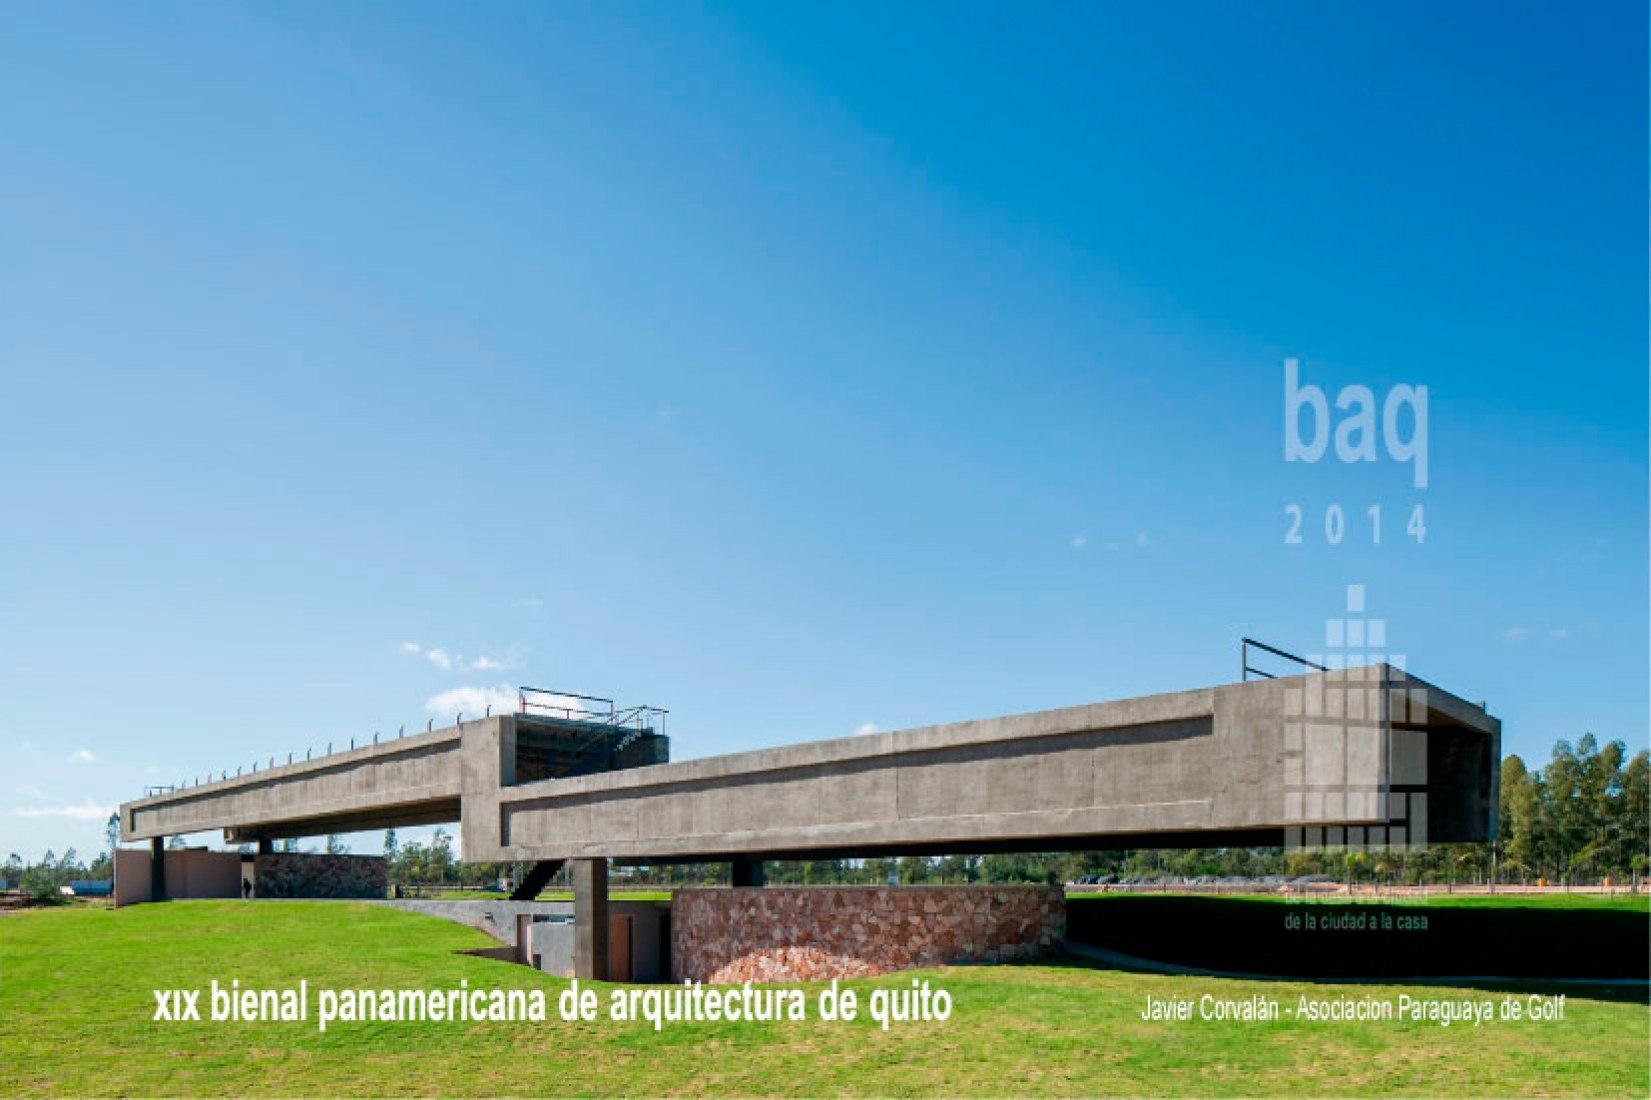 Paraguay Golf Association. Javier Corvalán. Photography © courtesy of XIX Bienal Panamericana de Arquitectura de Quito.